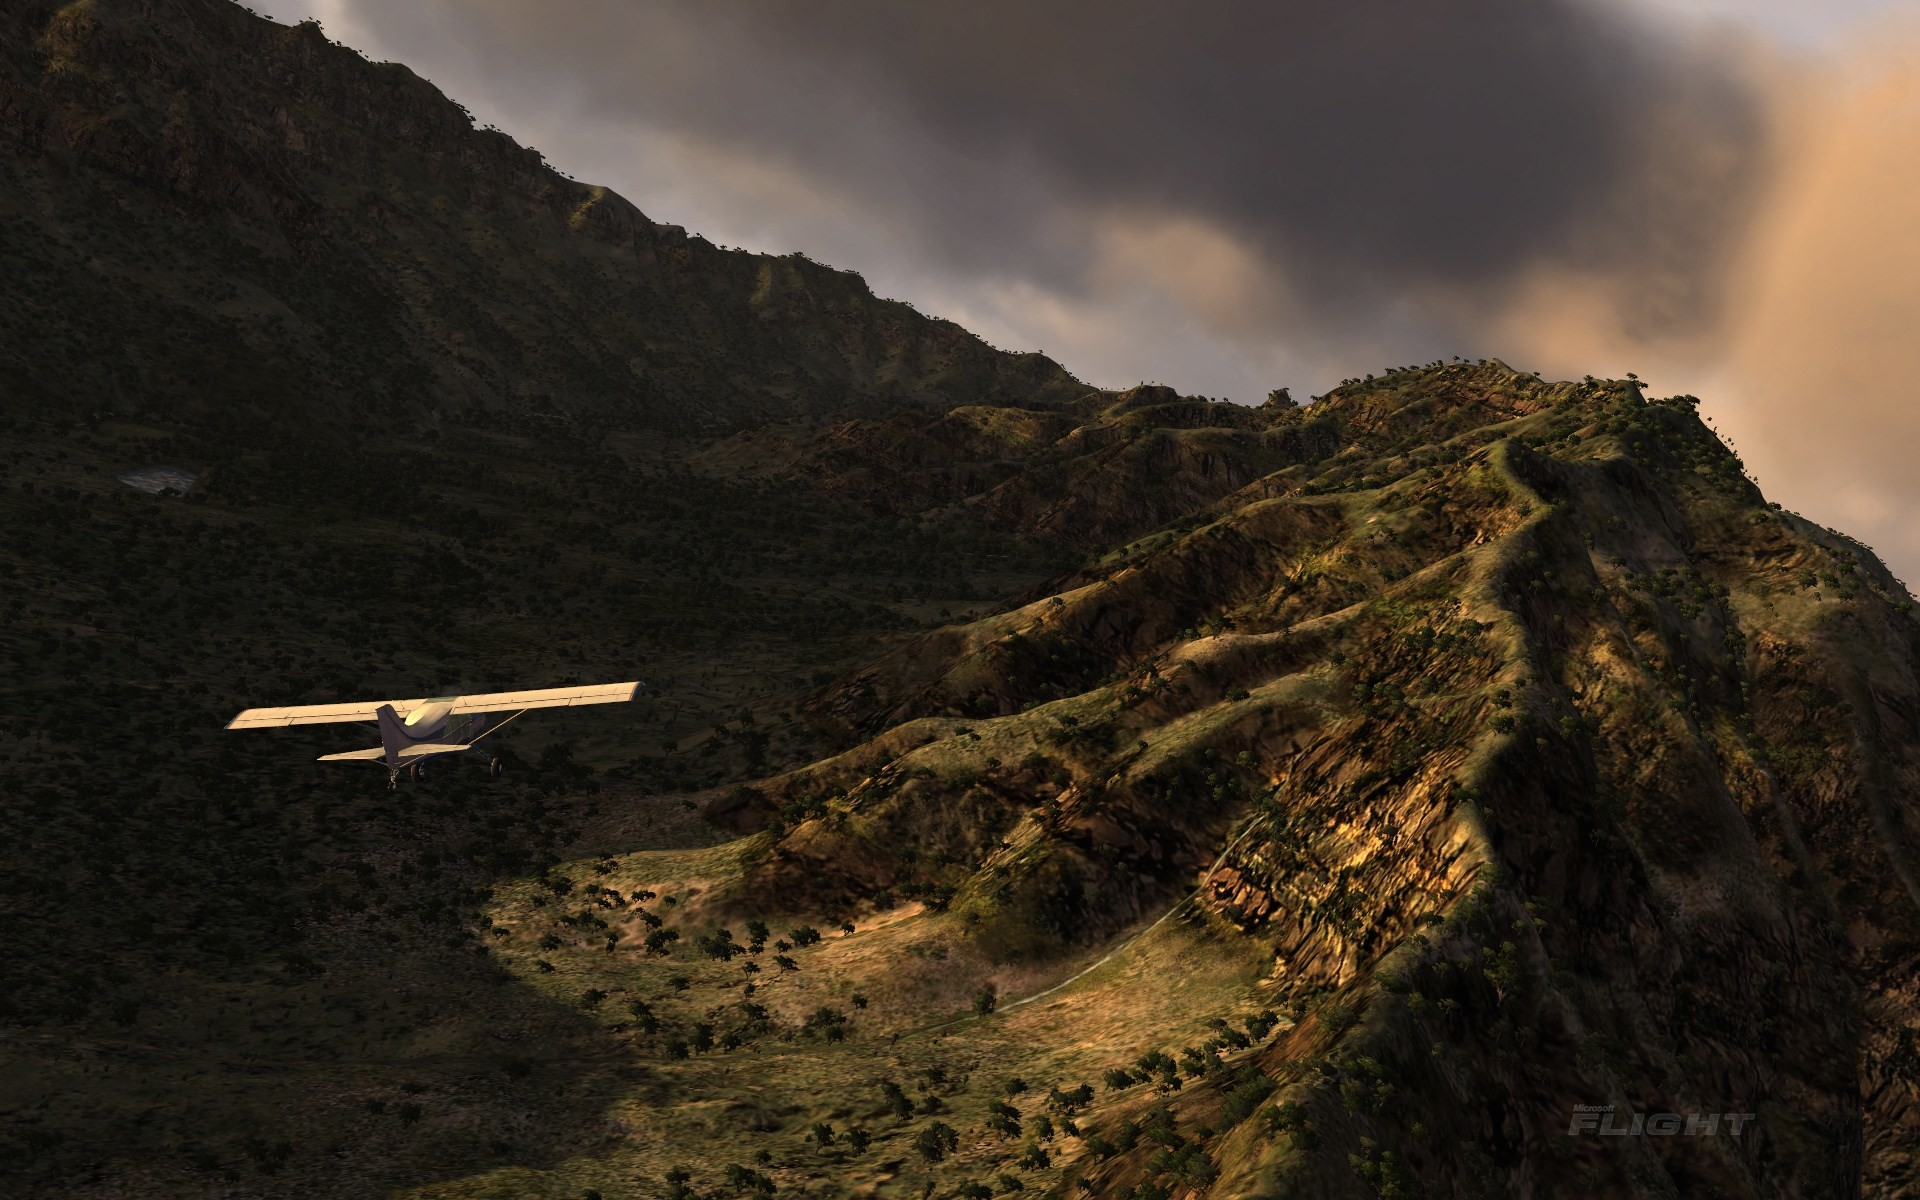 Edvin Blare – hd wallpaper microsoft flight hawaii – px